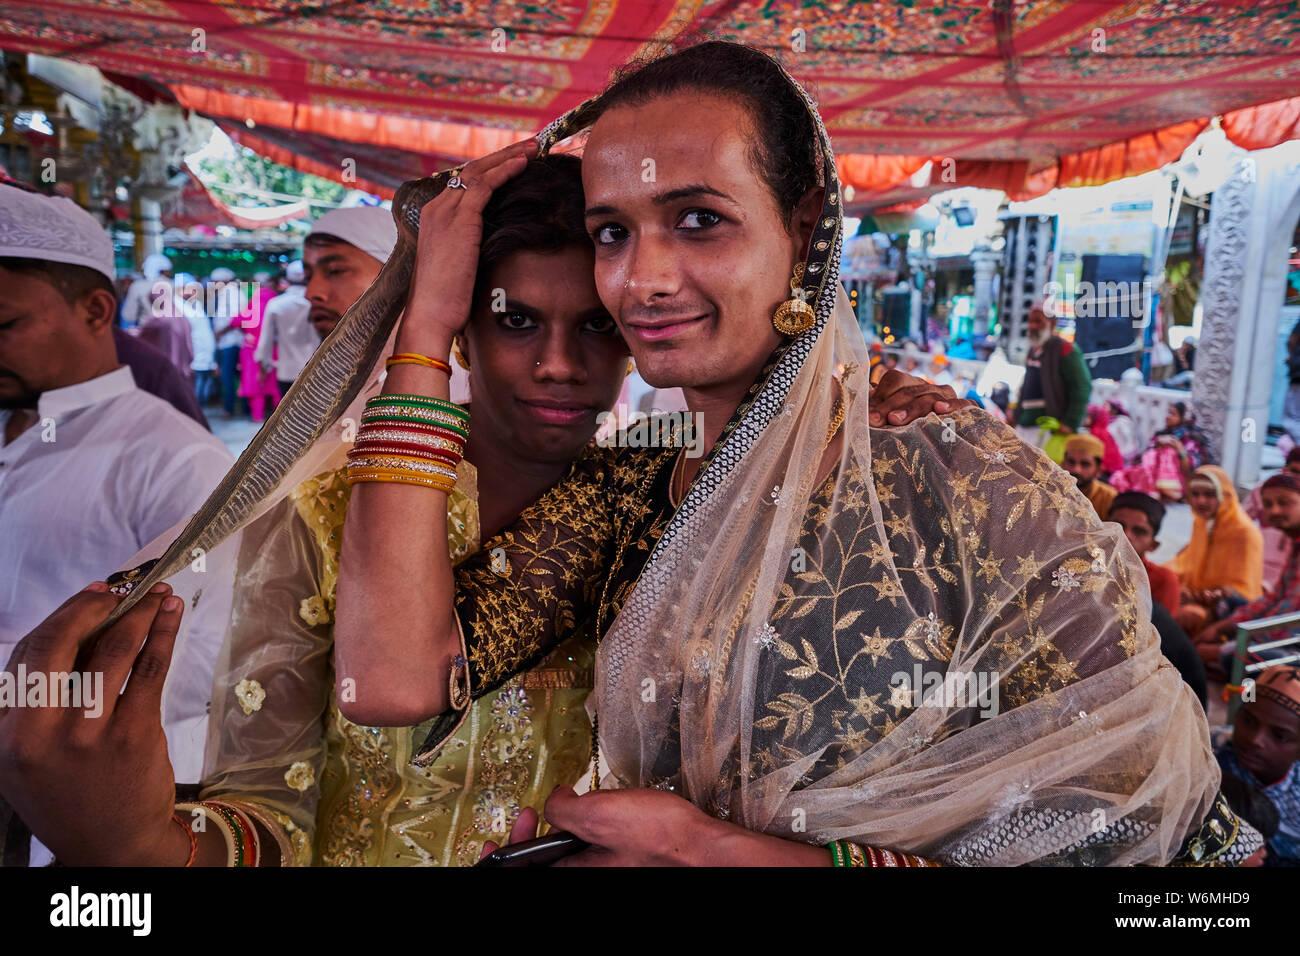 India Hijra Stock Photos & India Hijra Stock Images - Alamy